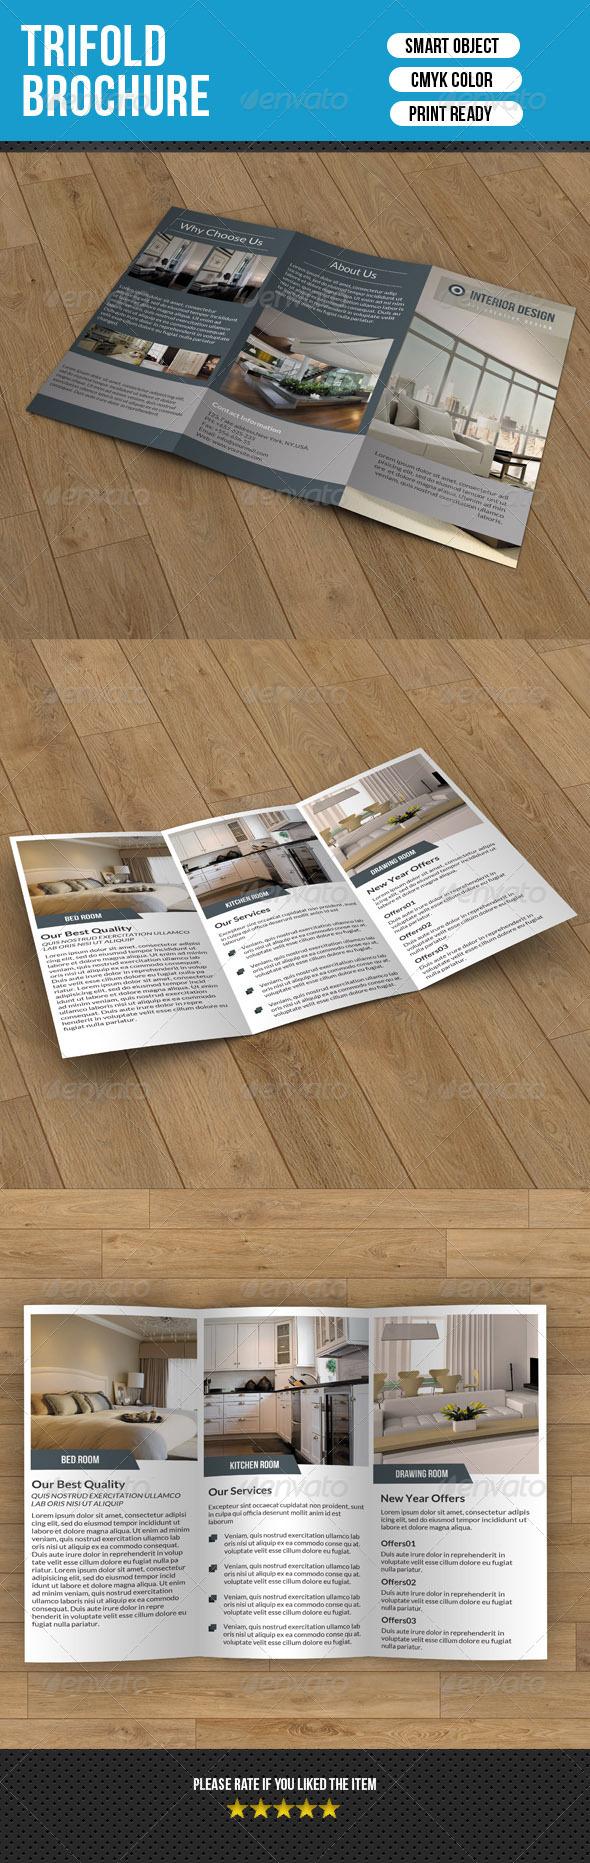 GraphicRiver Minimal Trifold-Interior Design V3 7016974